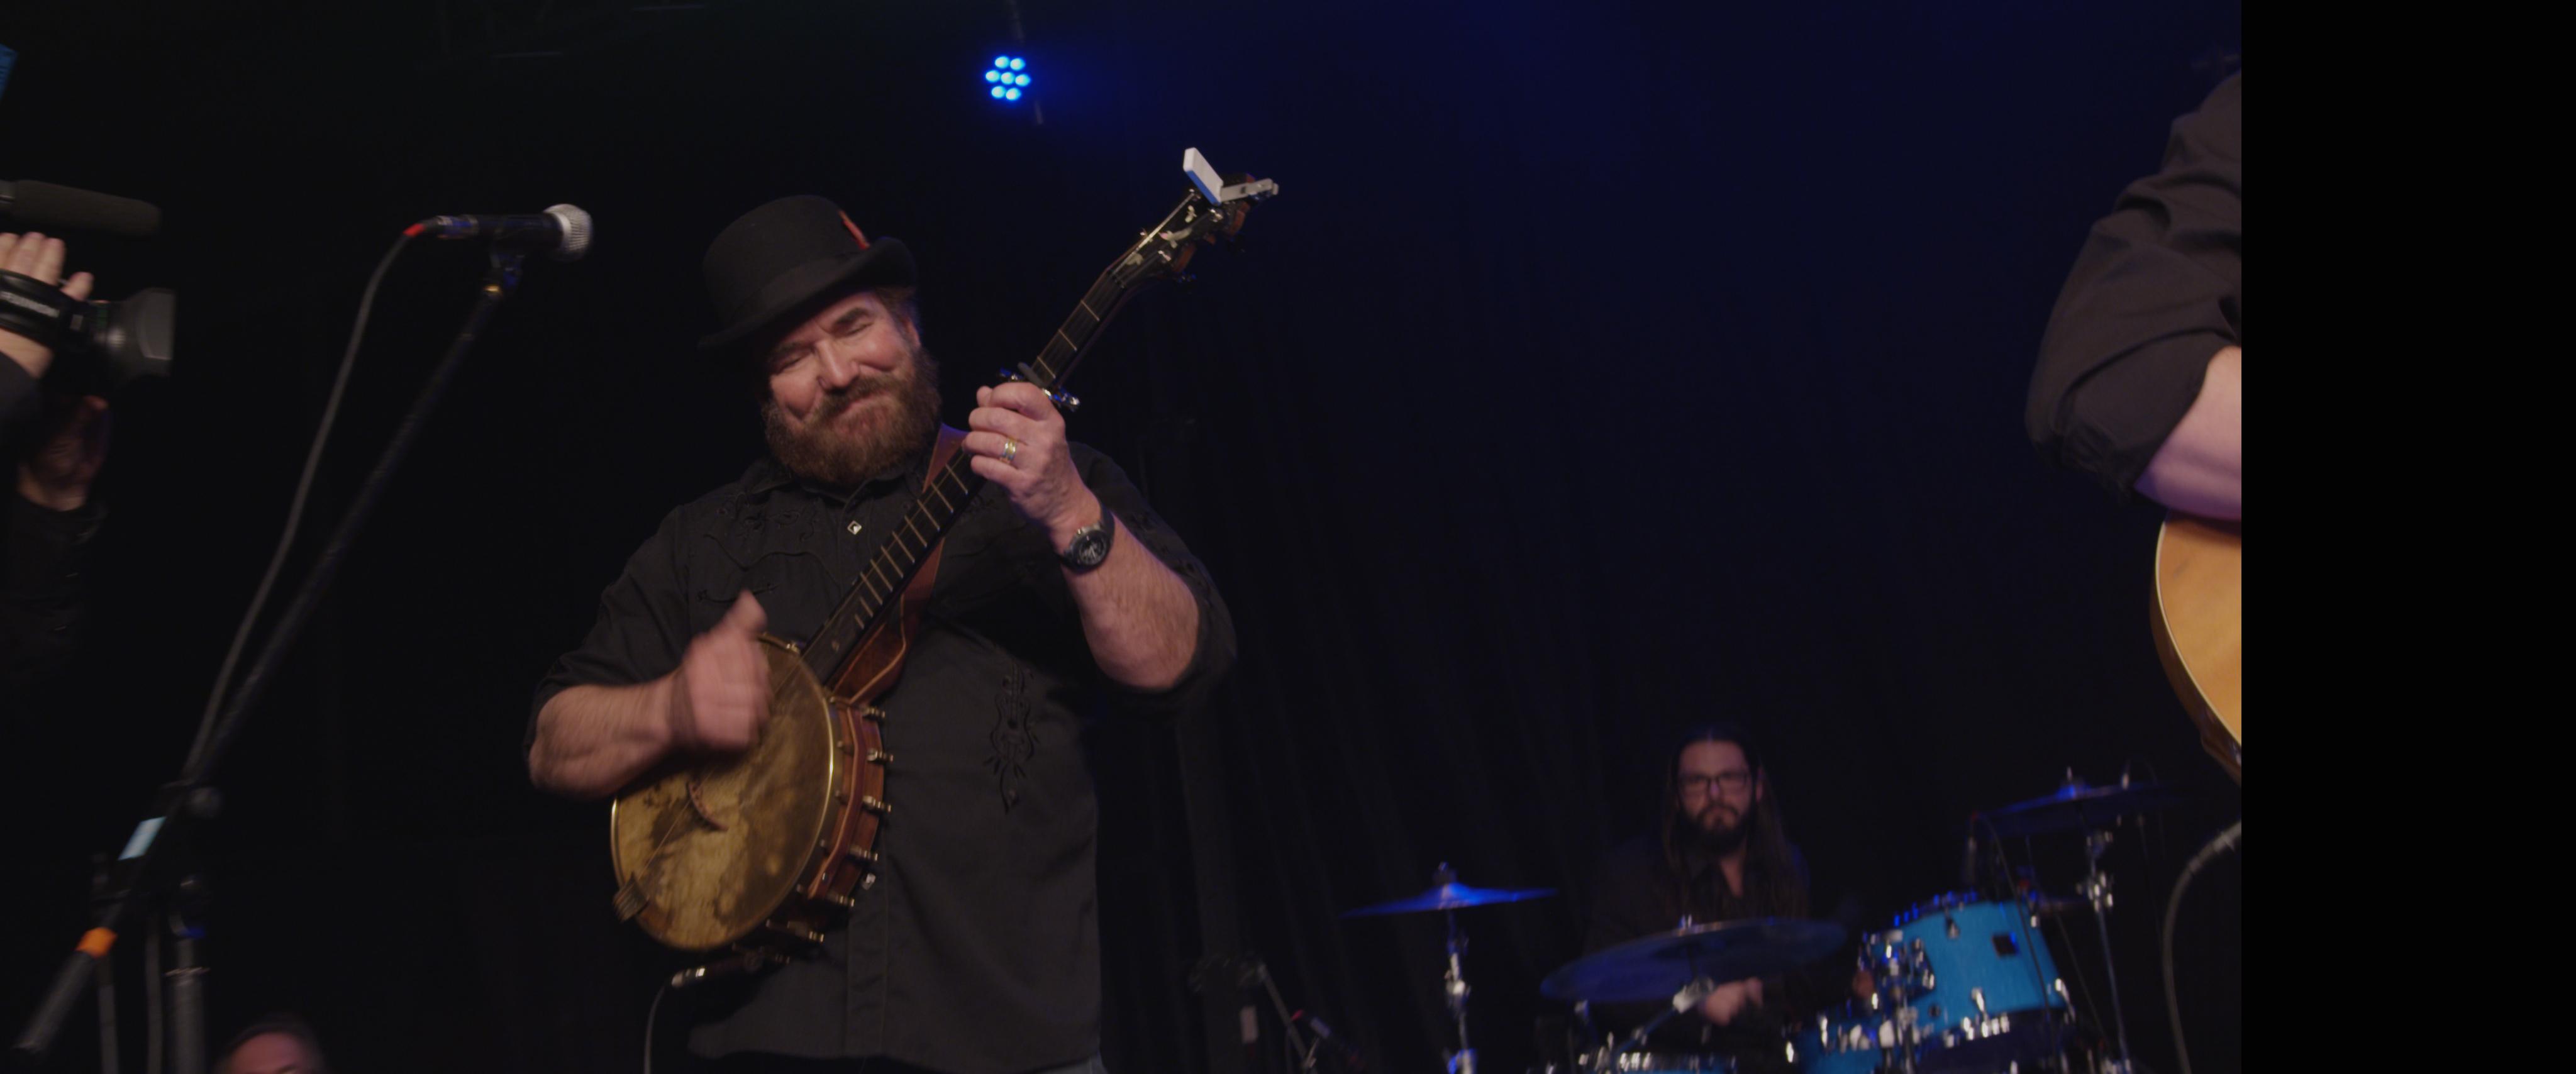 Blake Reid Band - 2017 ACMA's 15